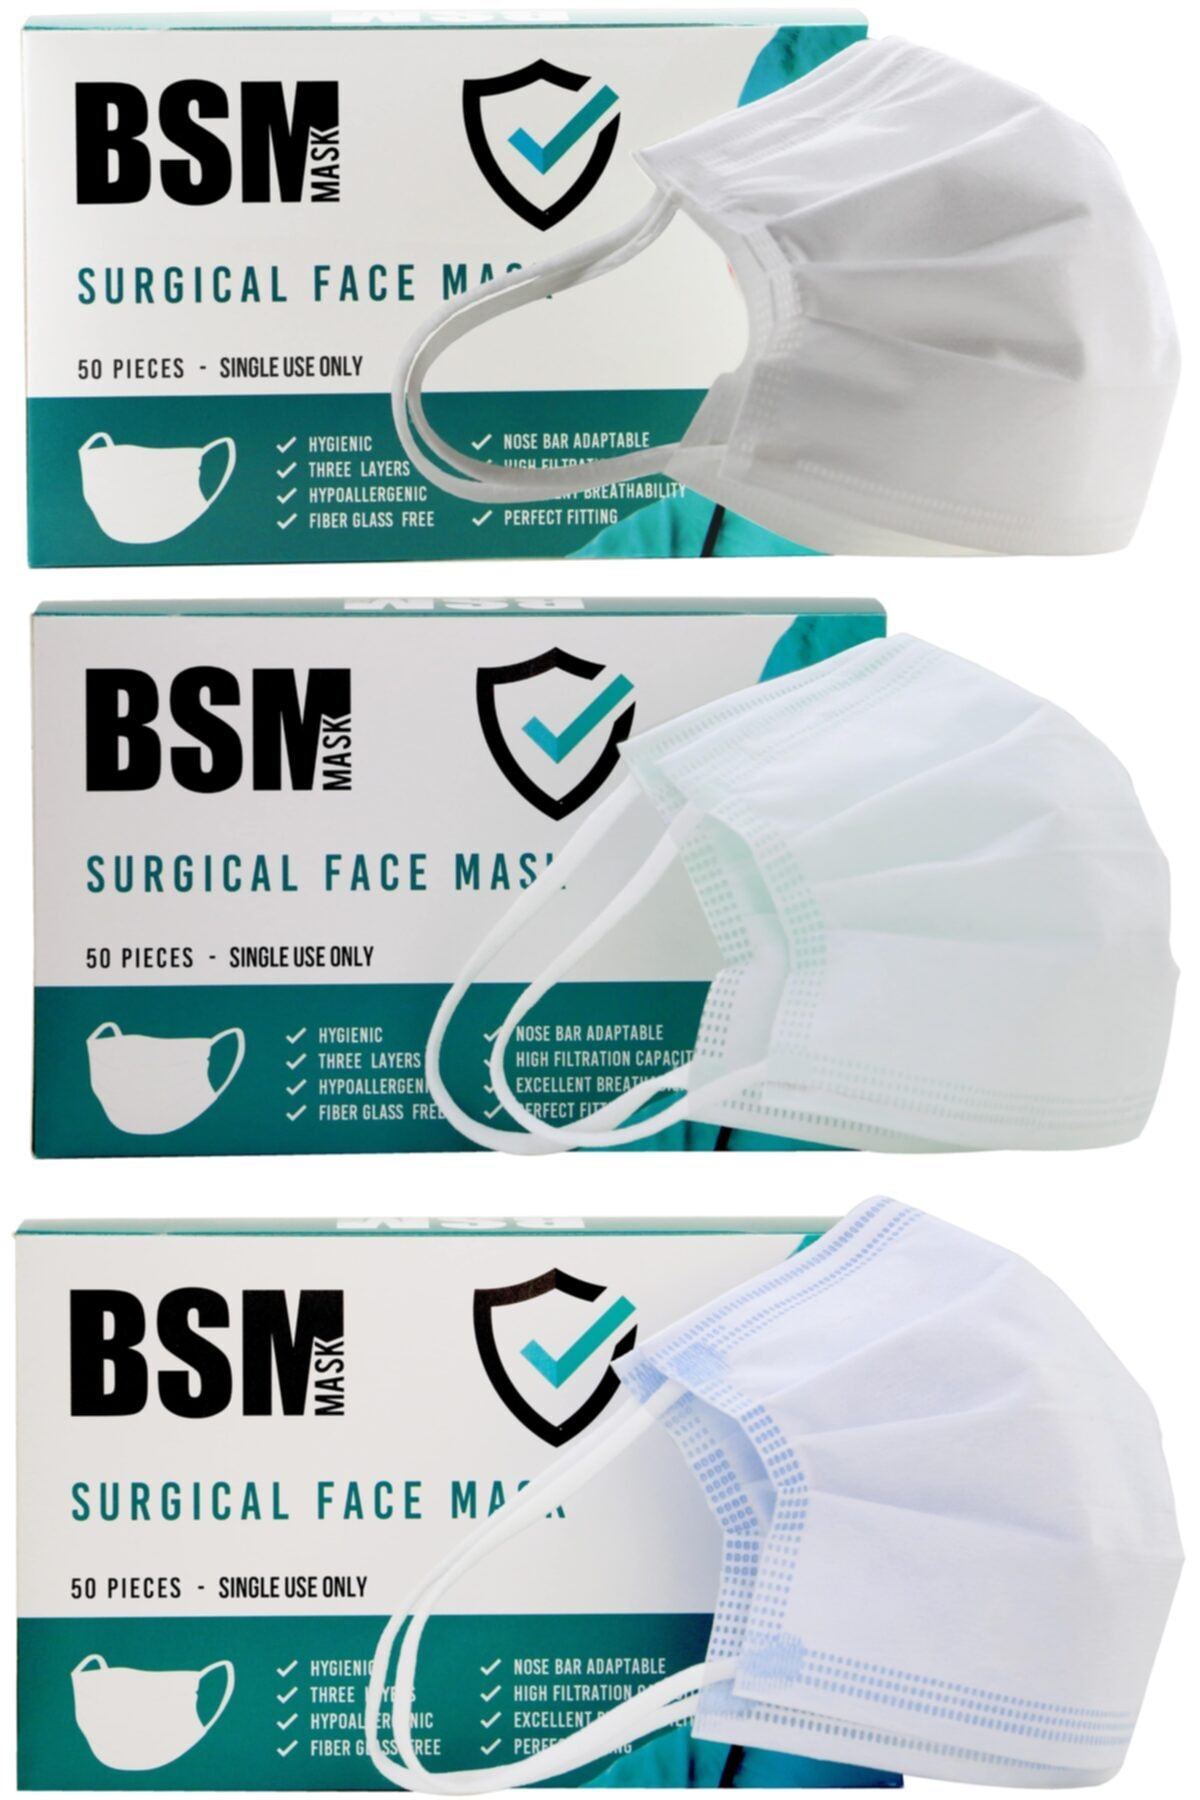 3 Katlı Yassı Lastikli Full Ultrasonik Meltblown Cerrahi Maske Toplam 50 Adet